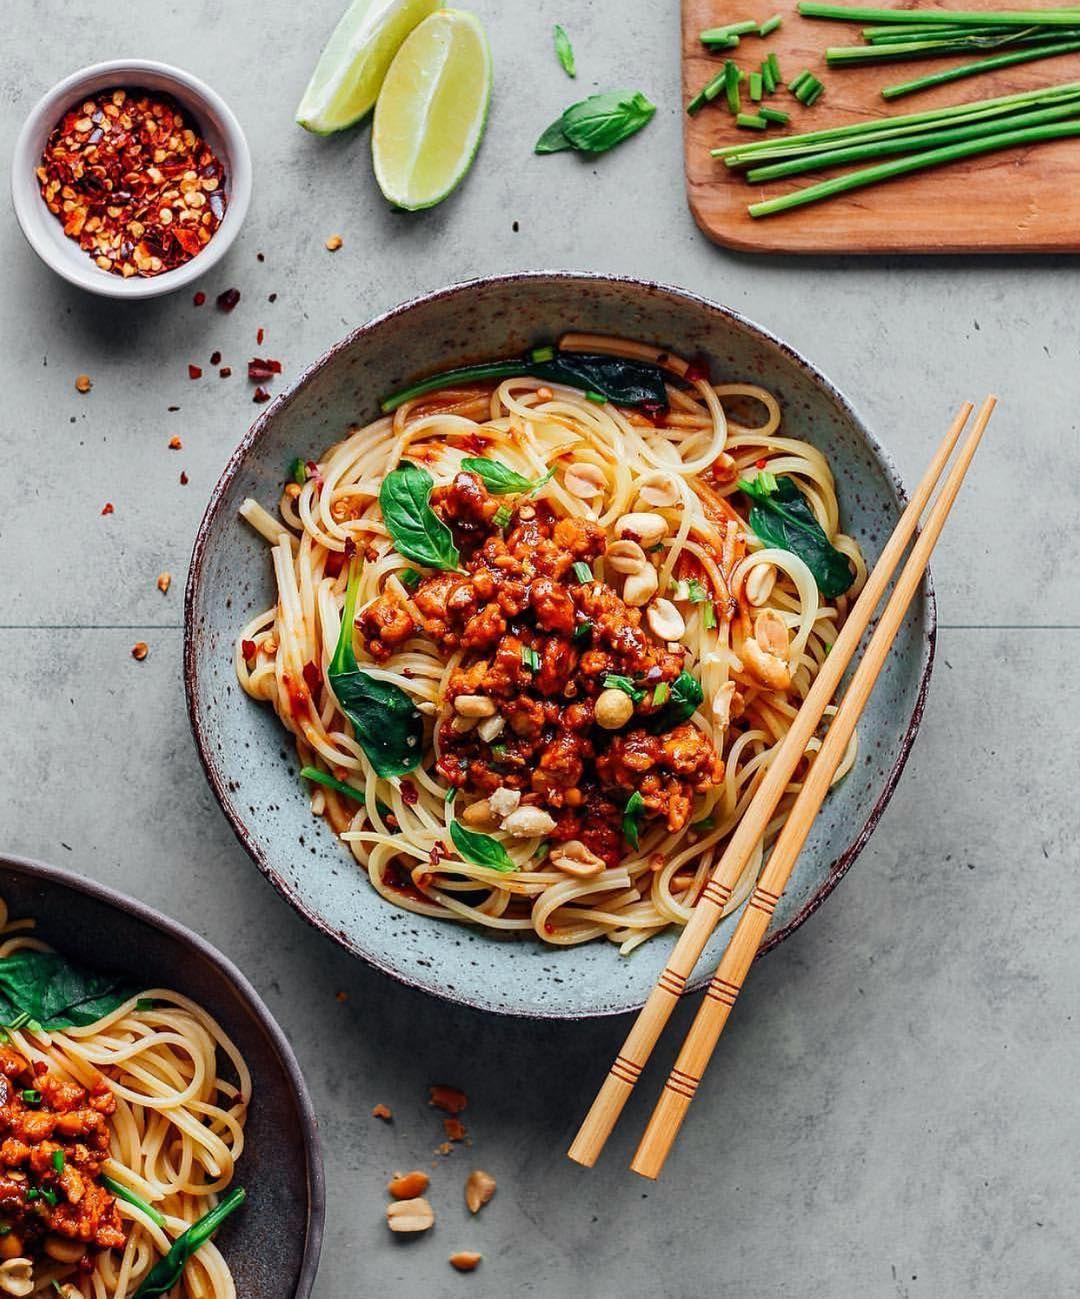 Pin By Jadyn On F O O D Vegan Recipes Food Tempeh